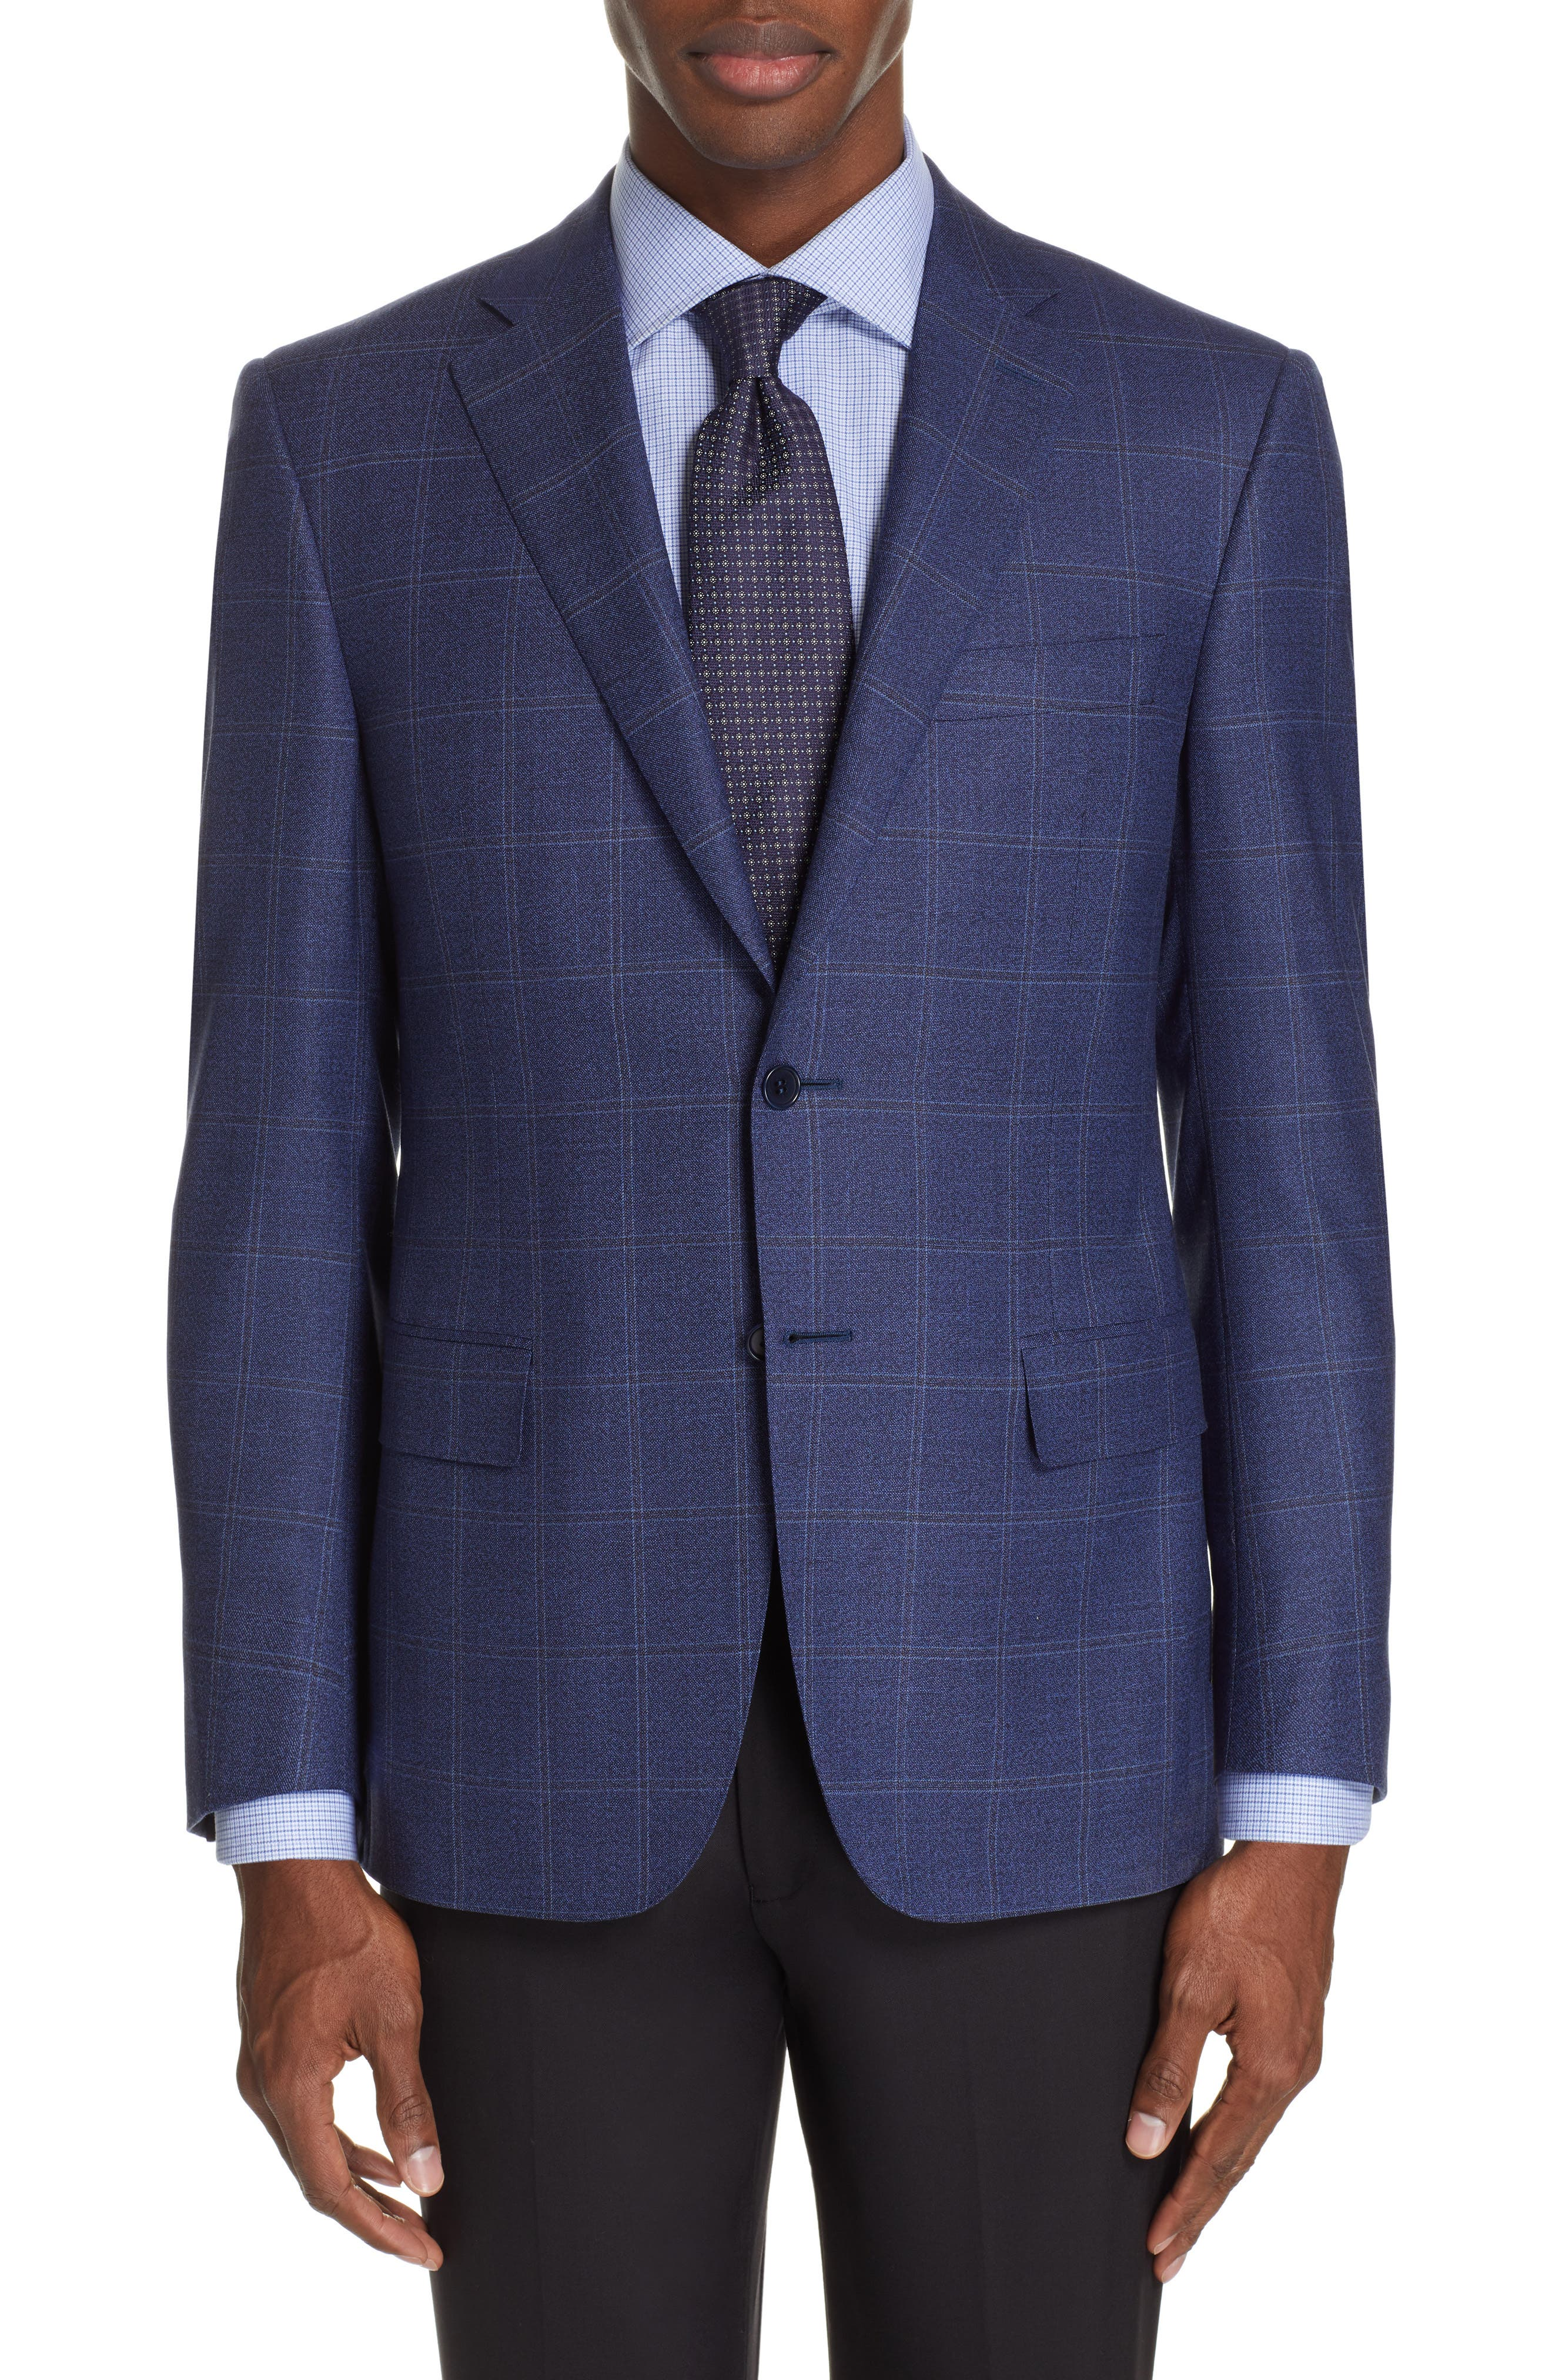 CANALI, Siena Classic Fit Plaid Wool Sport Coat, Main thumbnail 1, color, BLUE